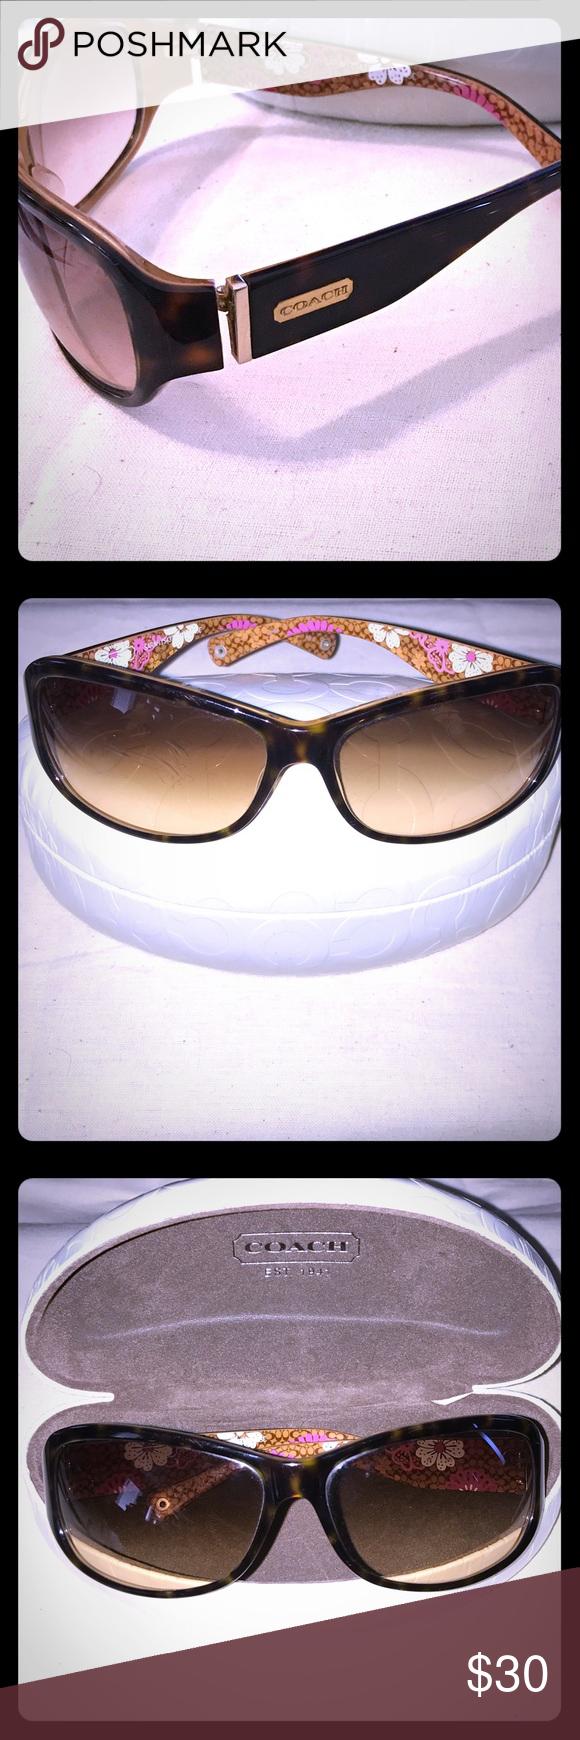 9ab038b7b0d7c 😎Coach Sarah Sunglasses (Authentic) Coach Tortoise Shell and Floral  Sunglasses. Brown tortoise